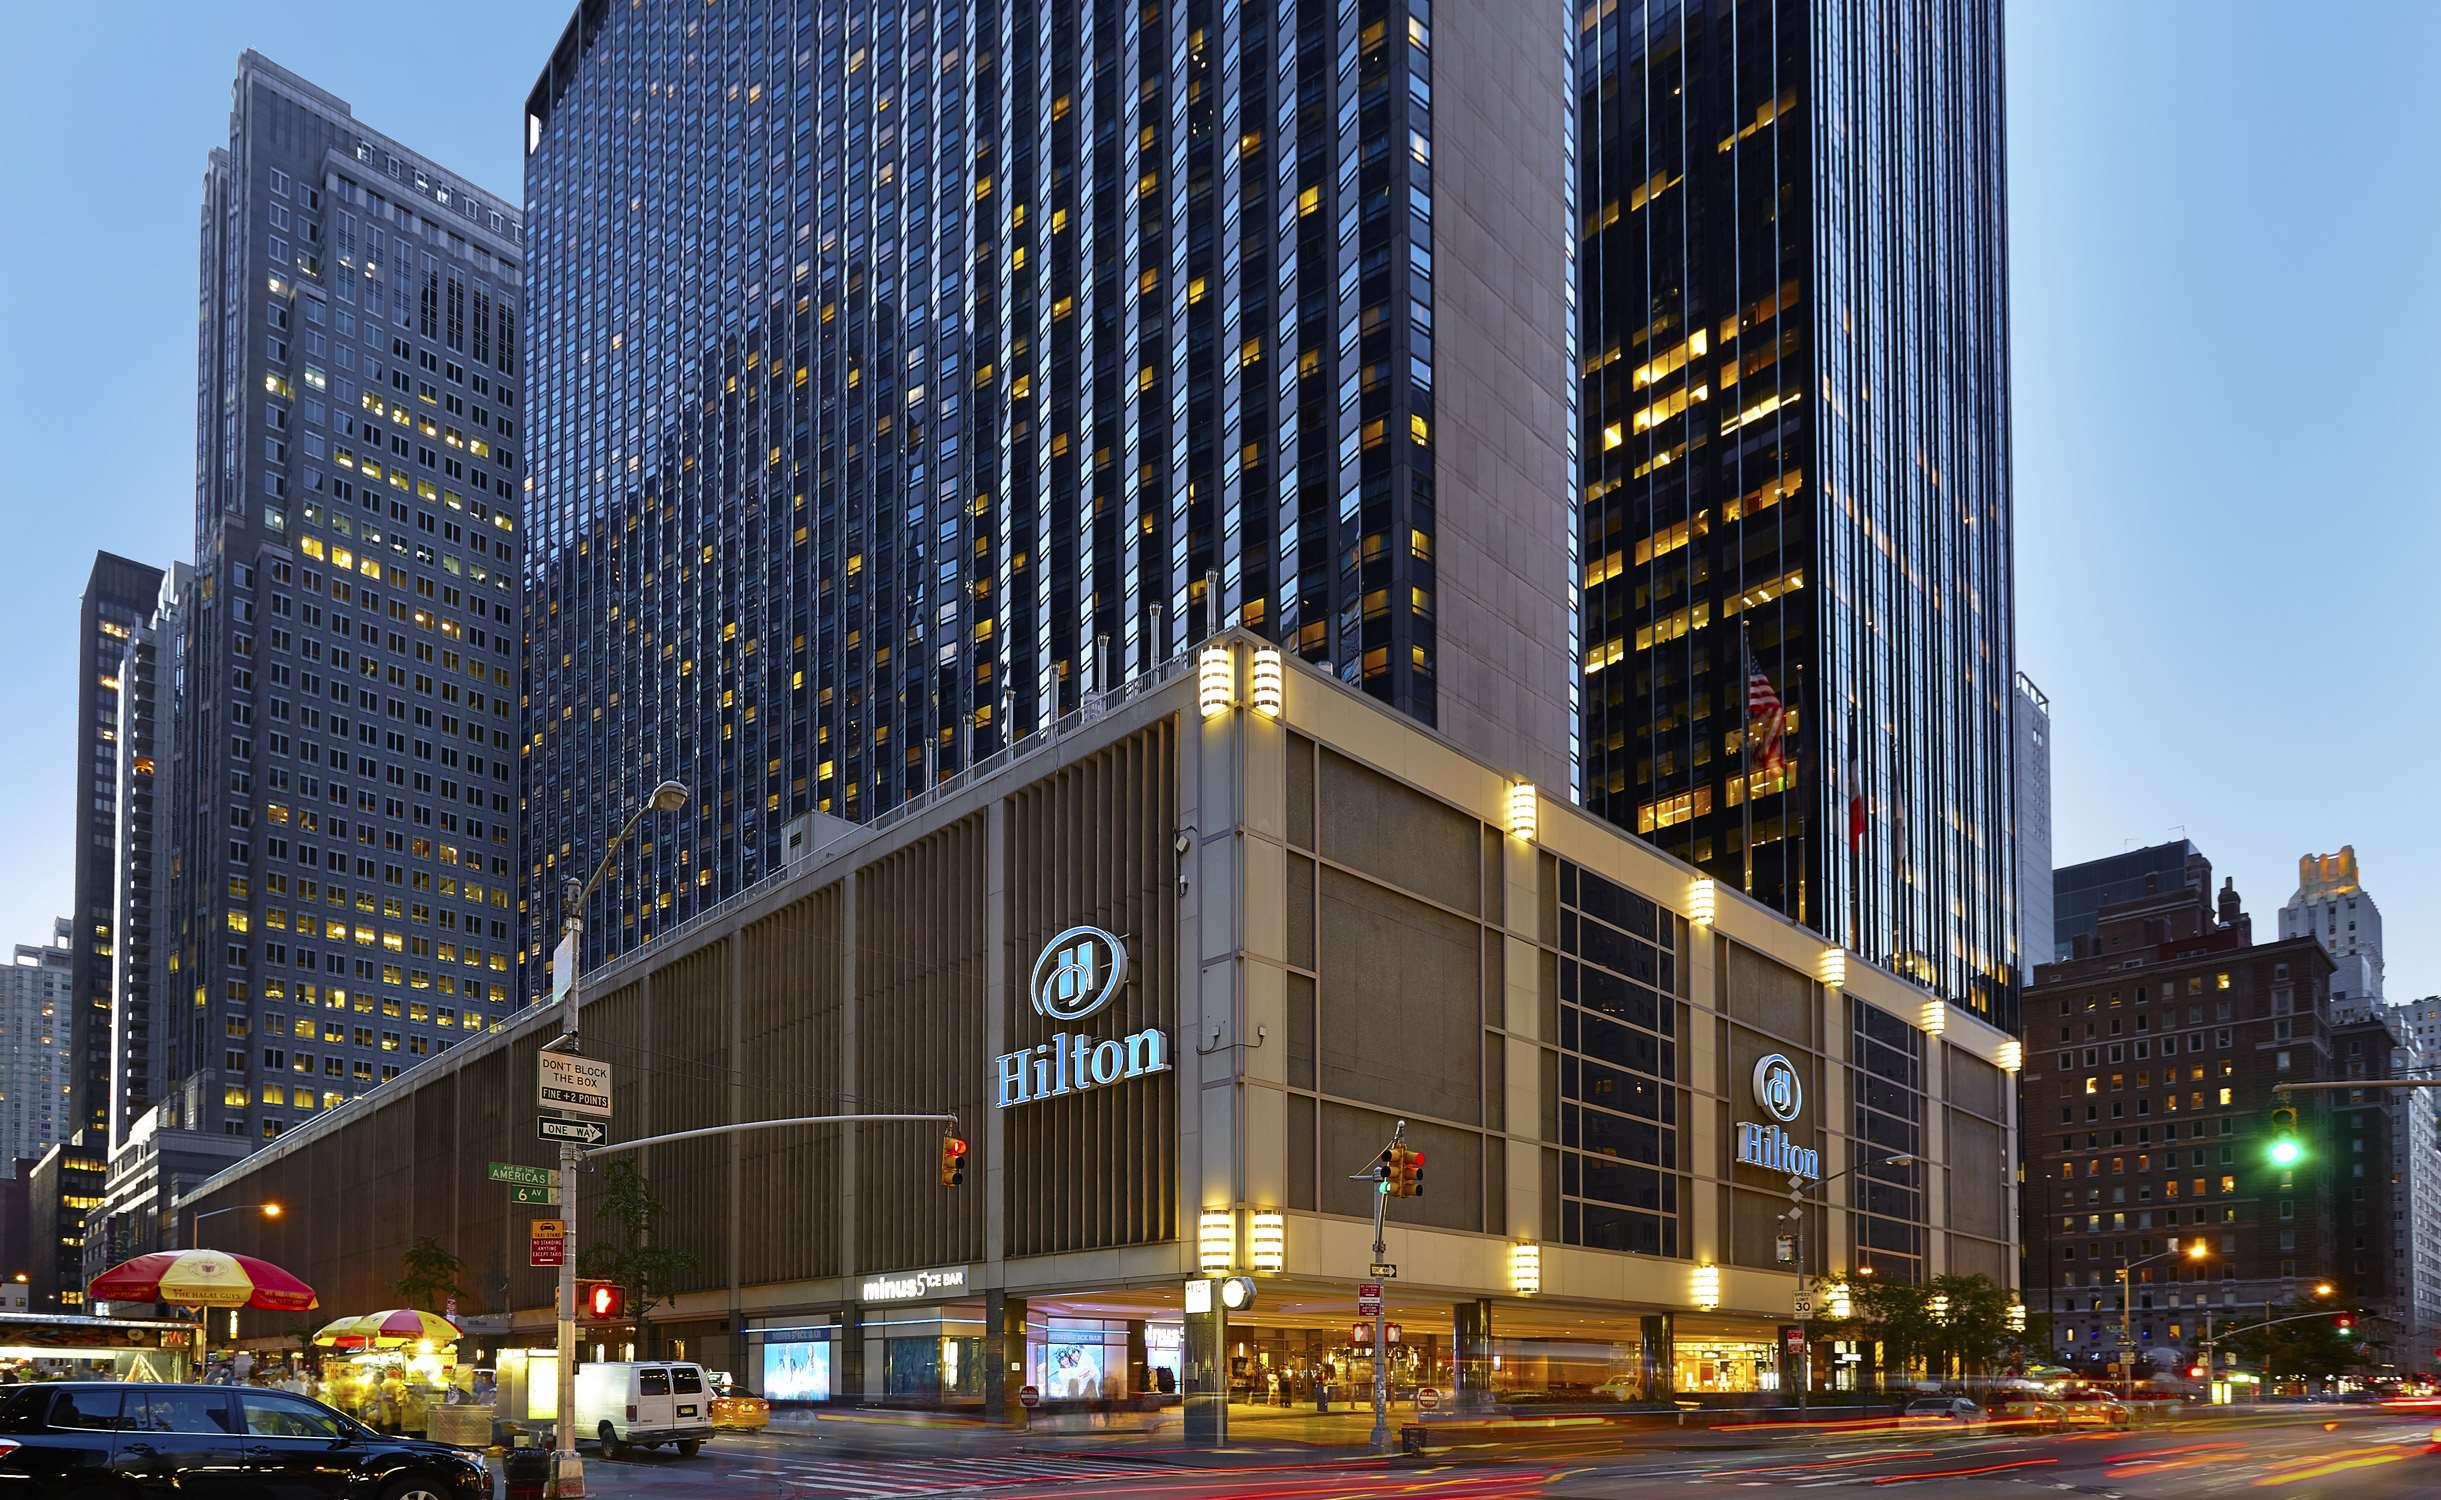 New York Hilton Midtown image 2